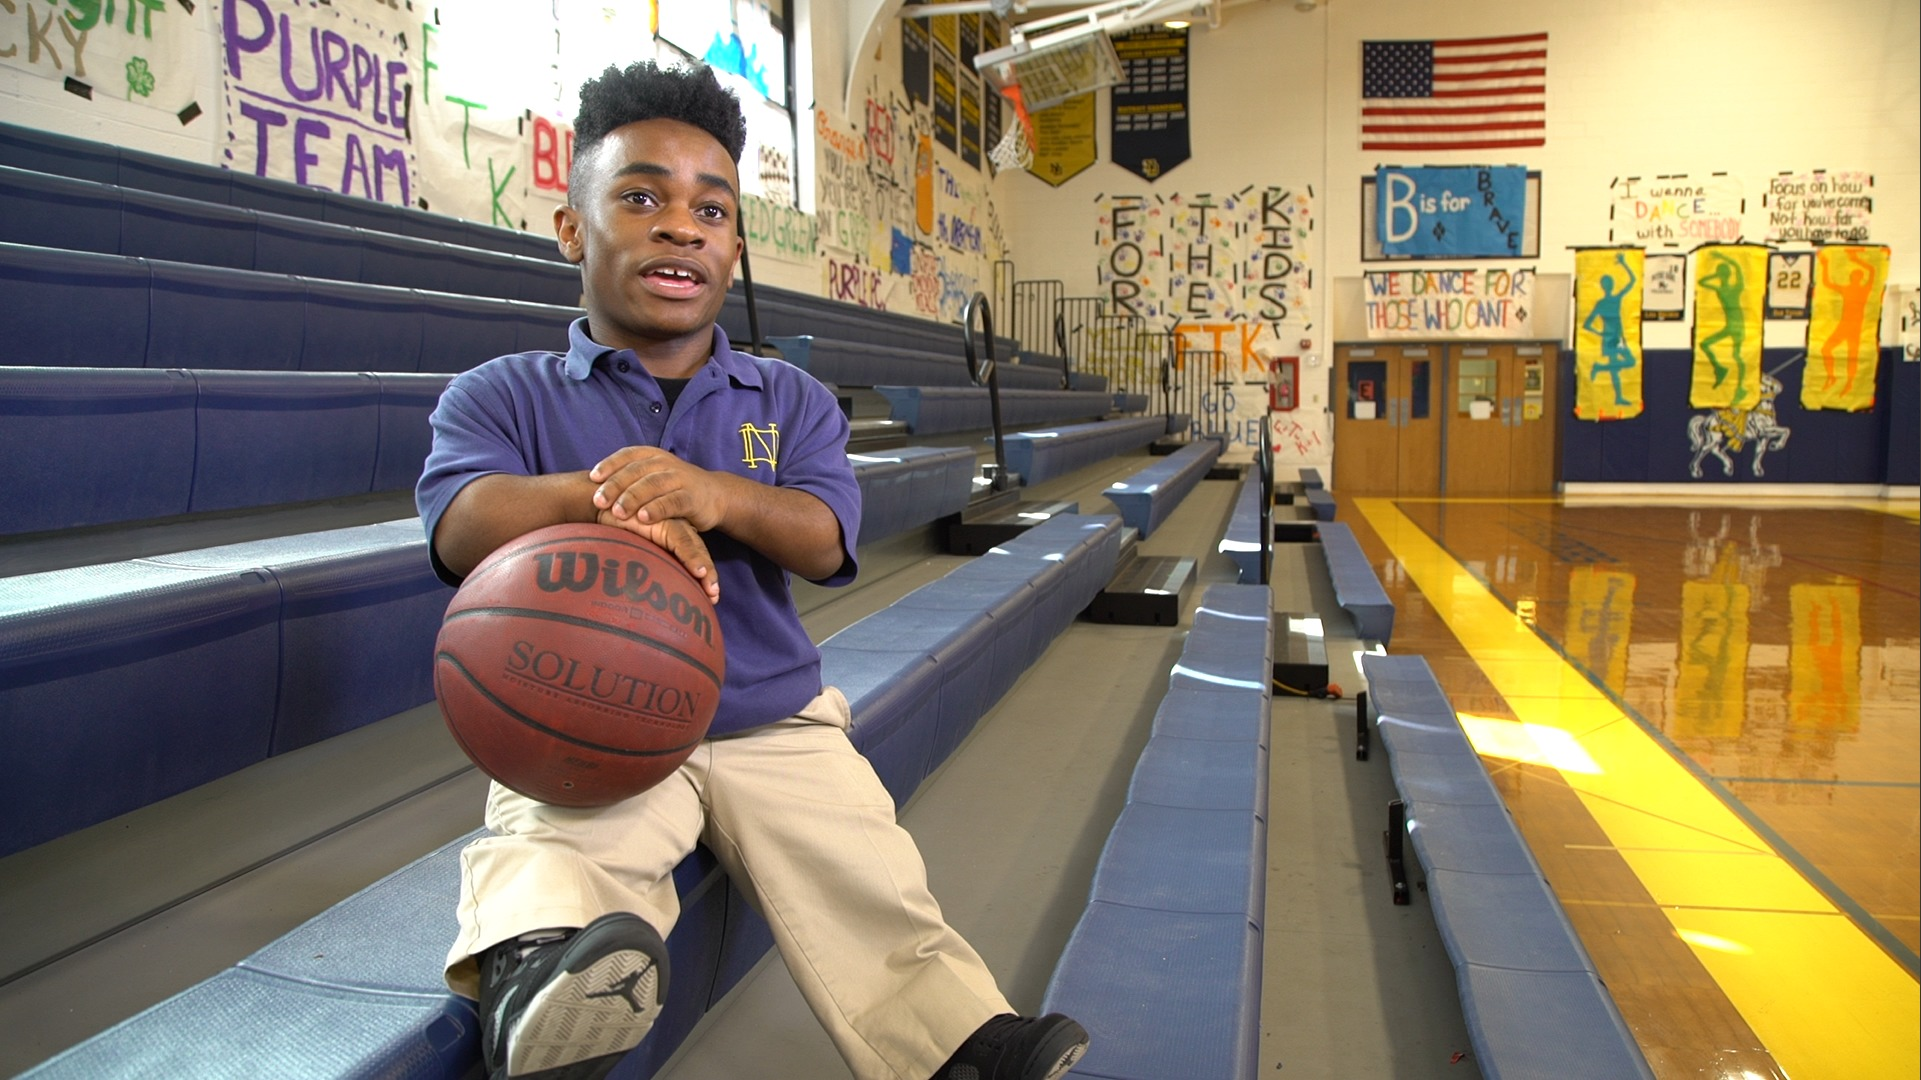 Mike Purvis 1.15m altura basquetbol Notre Dame